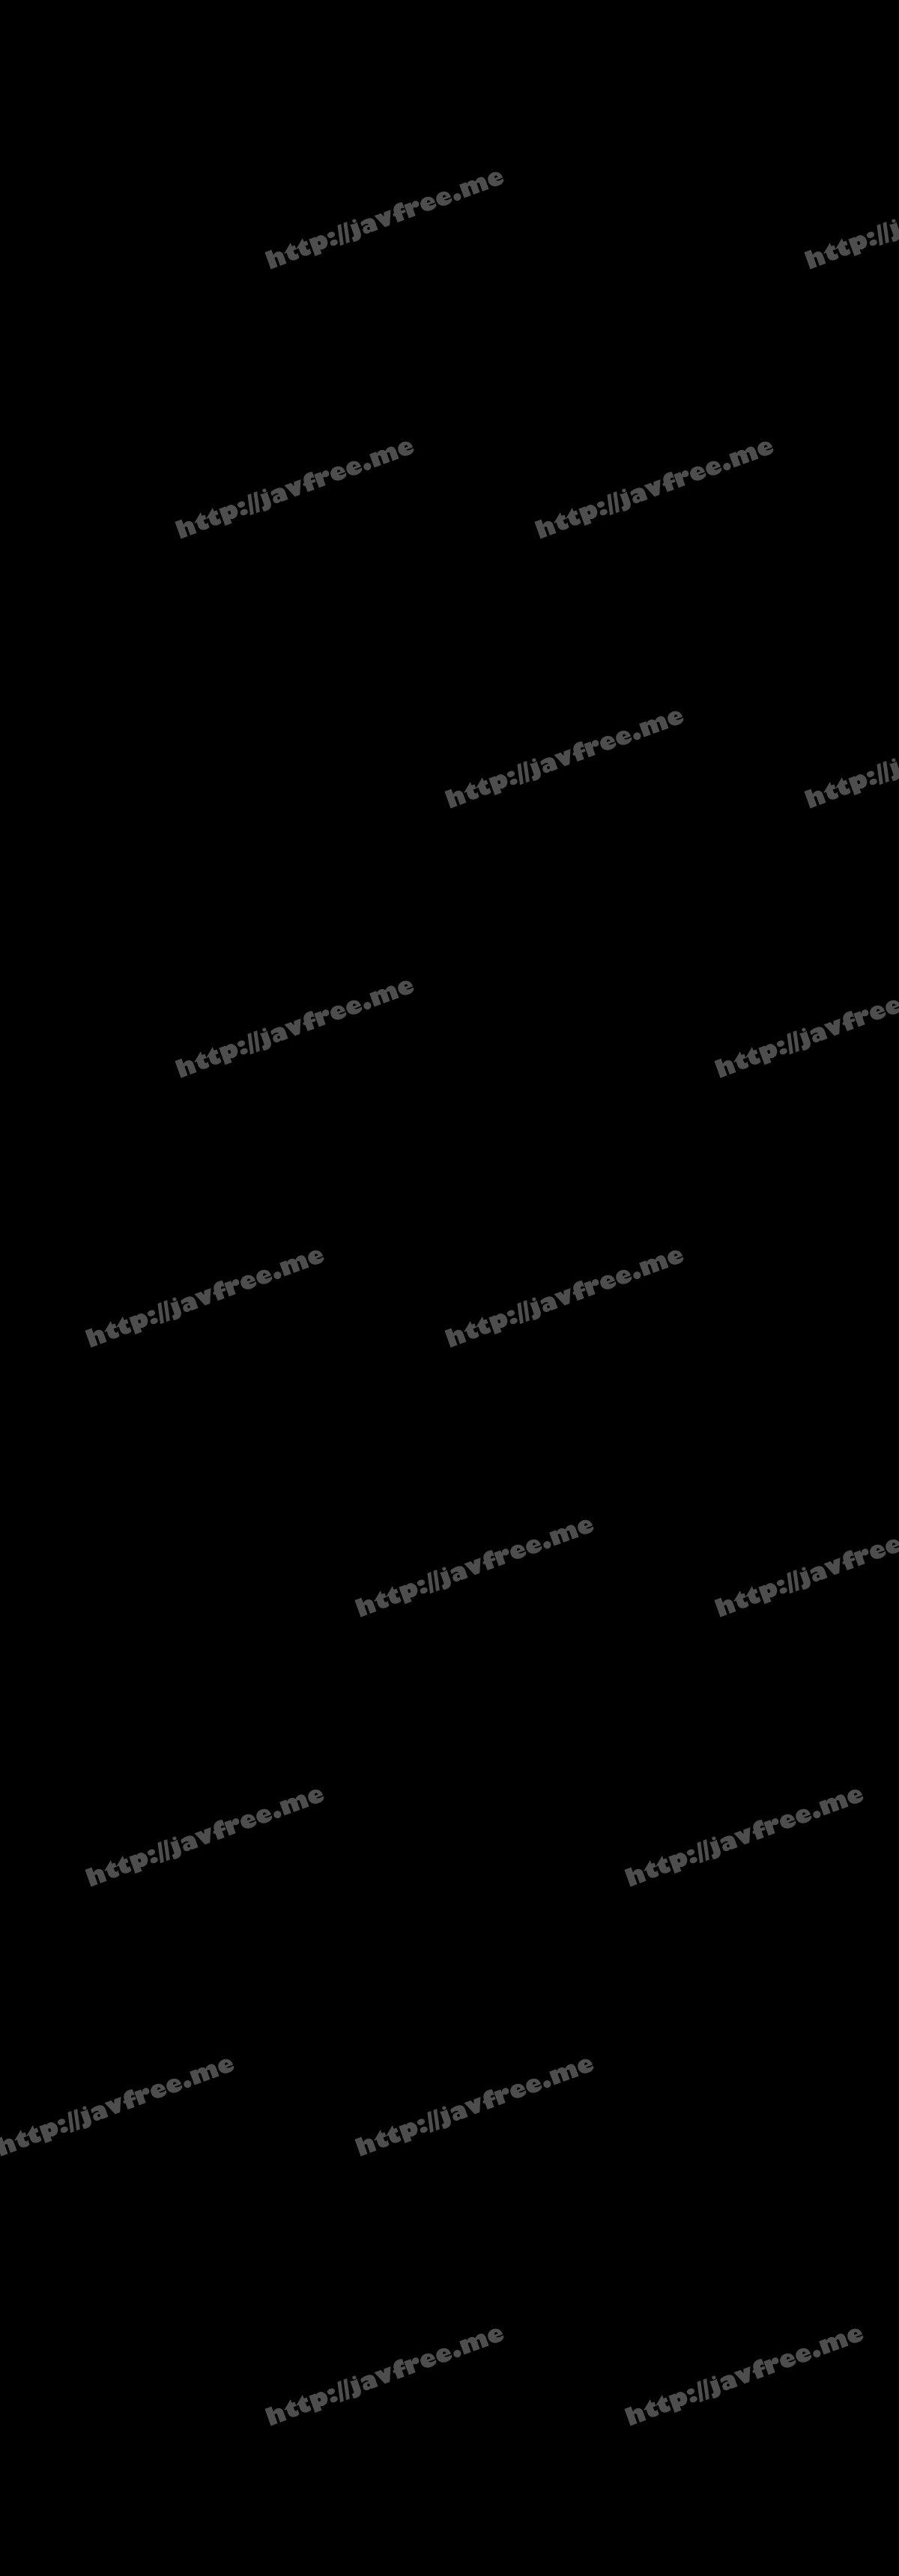 [HD][BHG-030] 悩殺'癒し痴女'お姉さん 大浦真奈美 - image BHG-030-1080p on https://javfree.me